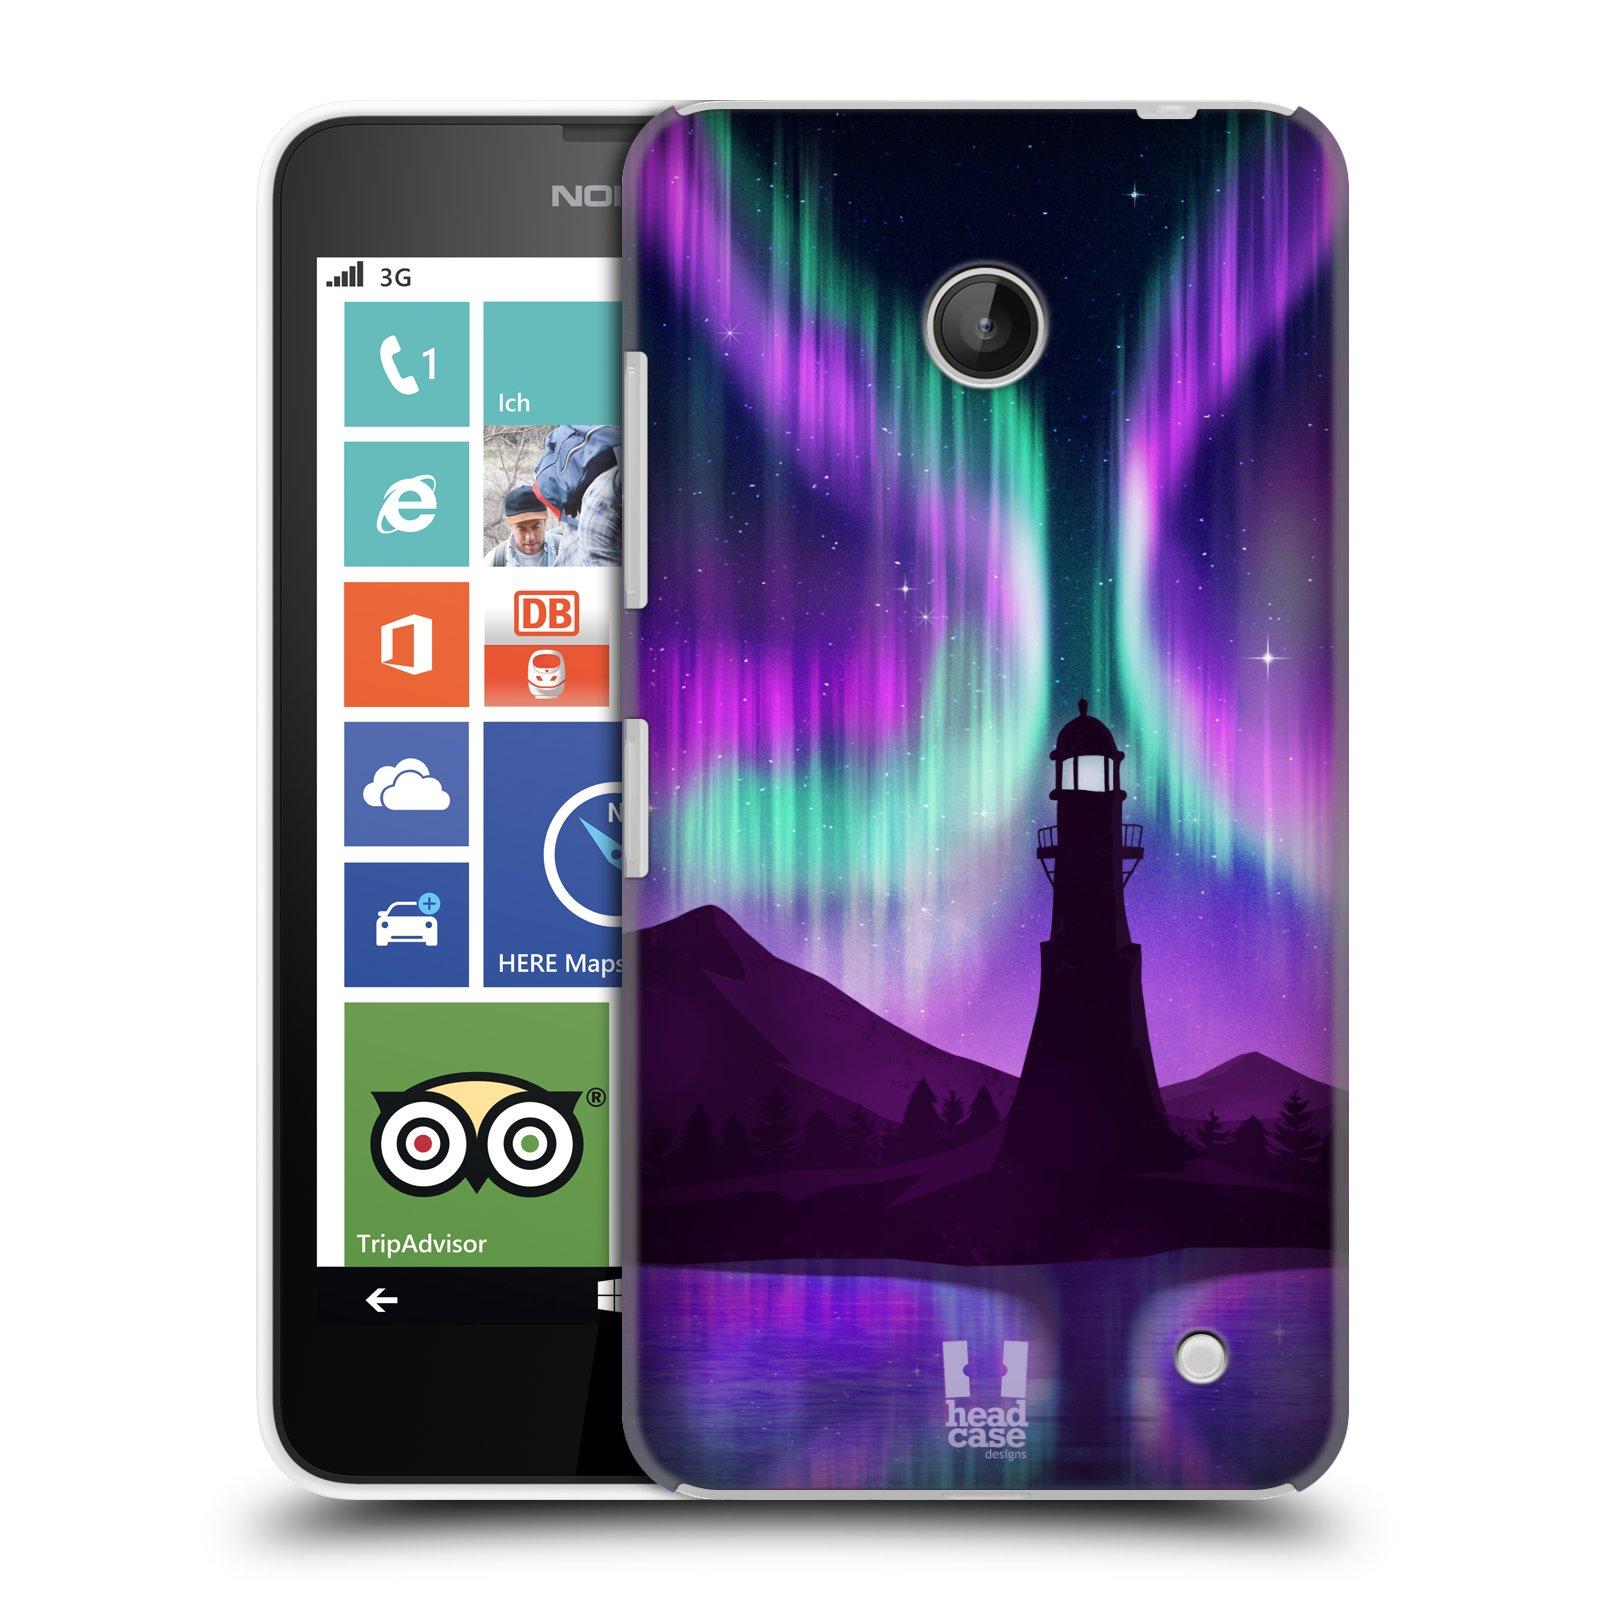 Plastové pouzdro na mobil Nokia Lumia 630 HEAD CASE Polární Záře Maják (Kryt či obal na mobilní telefon Nokia Lumia 630 a Nokia Lumia 630 Dual SIM)